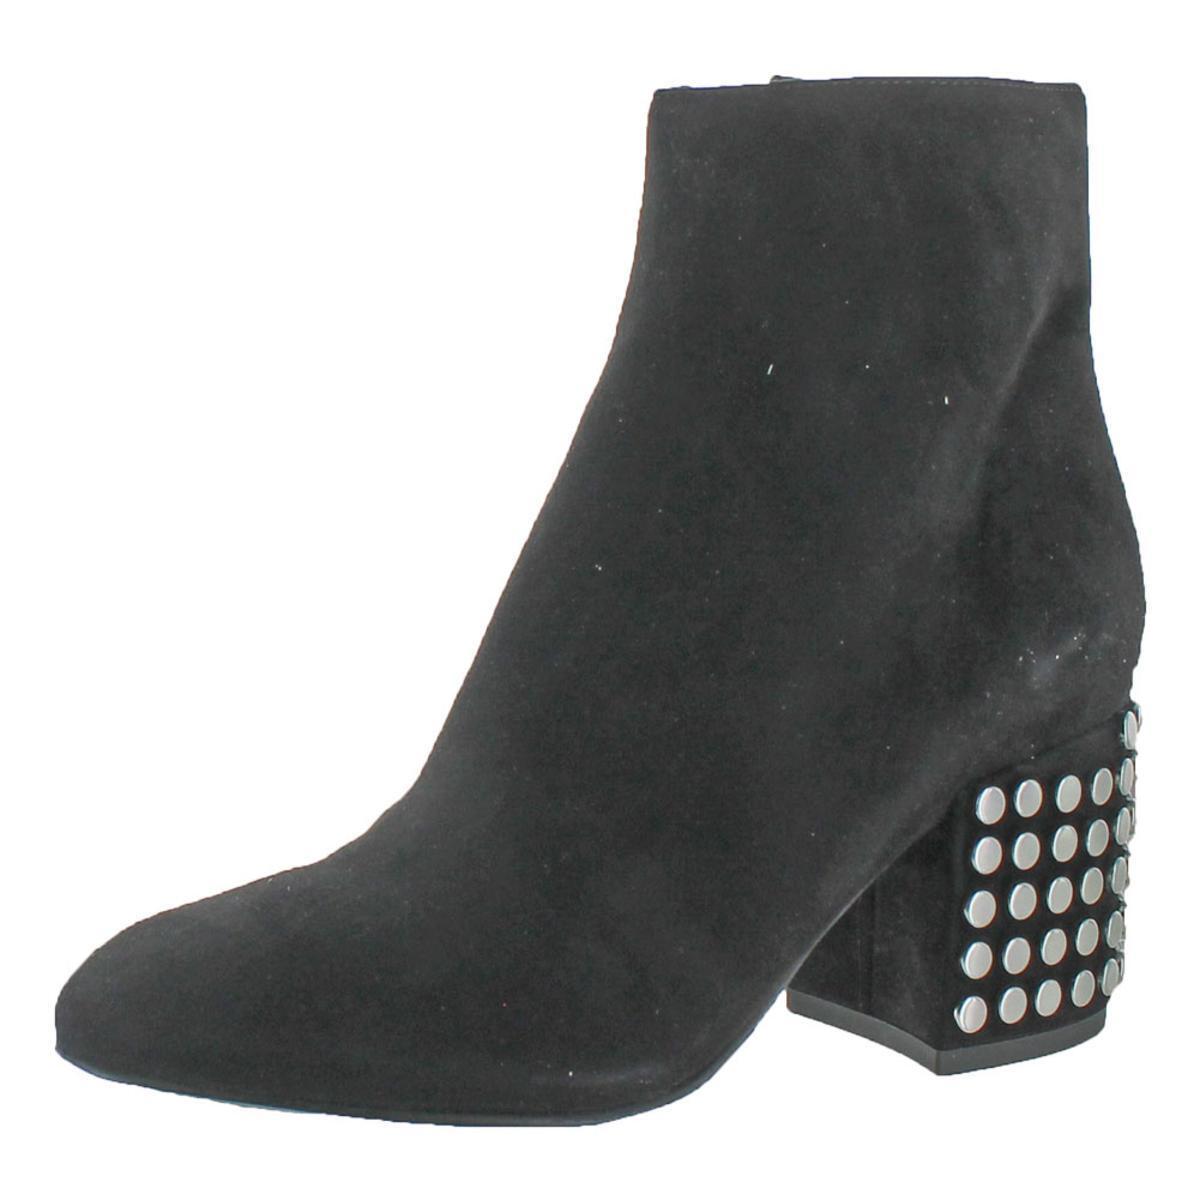 Kendall + Kylie Womens Blythe 3 Black Ankle Boots Shoes 8 Medium (B,M) BHFO 4876